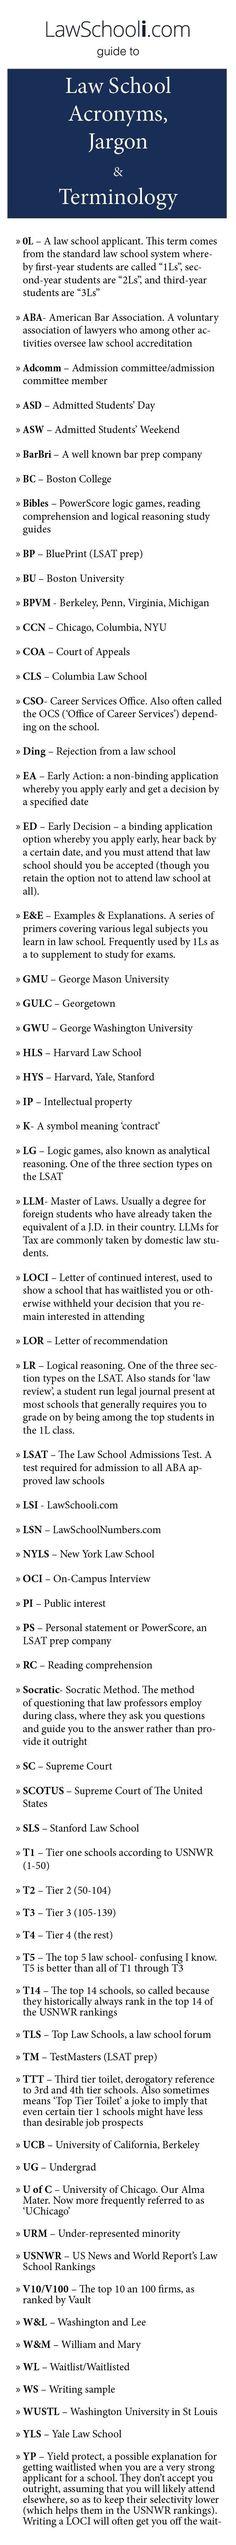 LawSchooli.com Guide to Law School Acronyms, Jargon Terminology